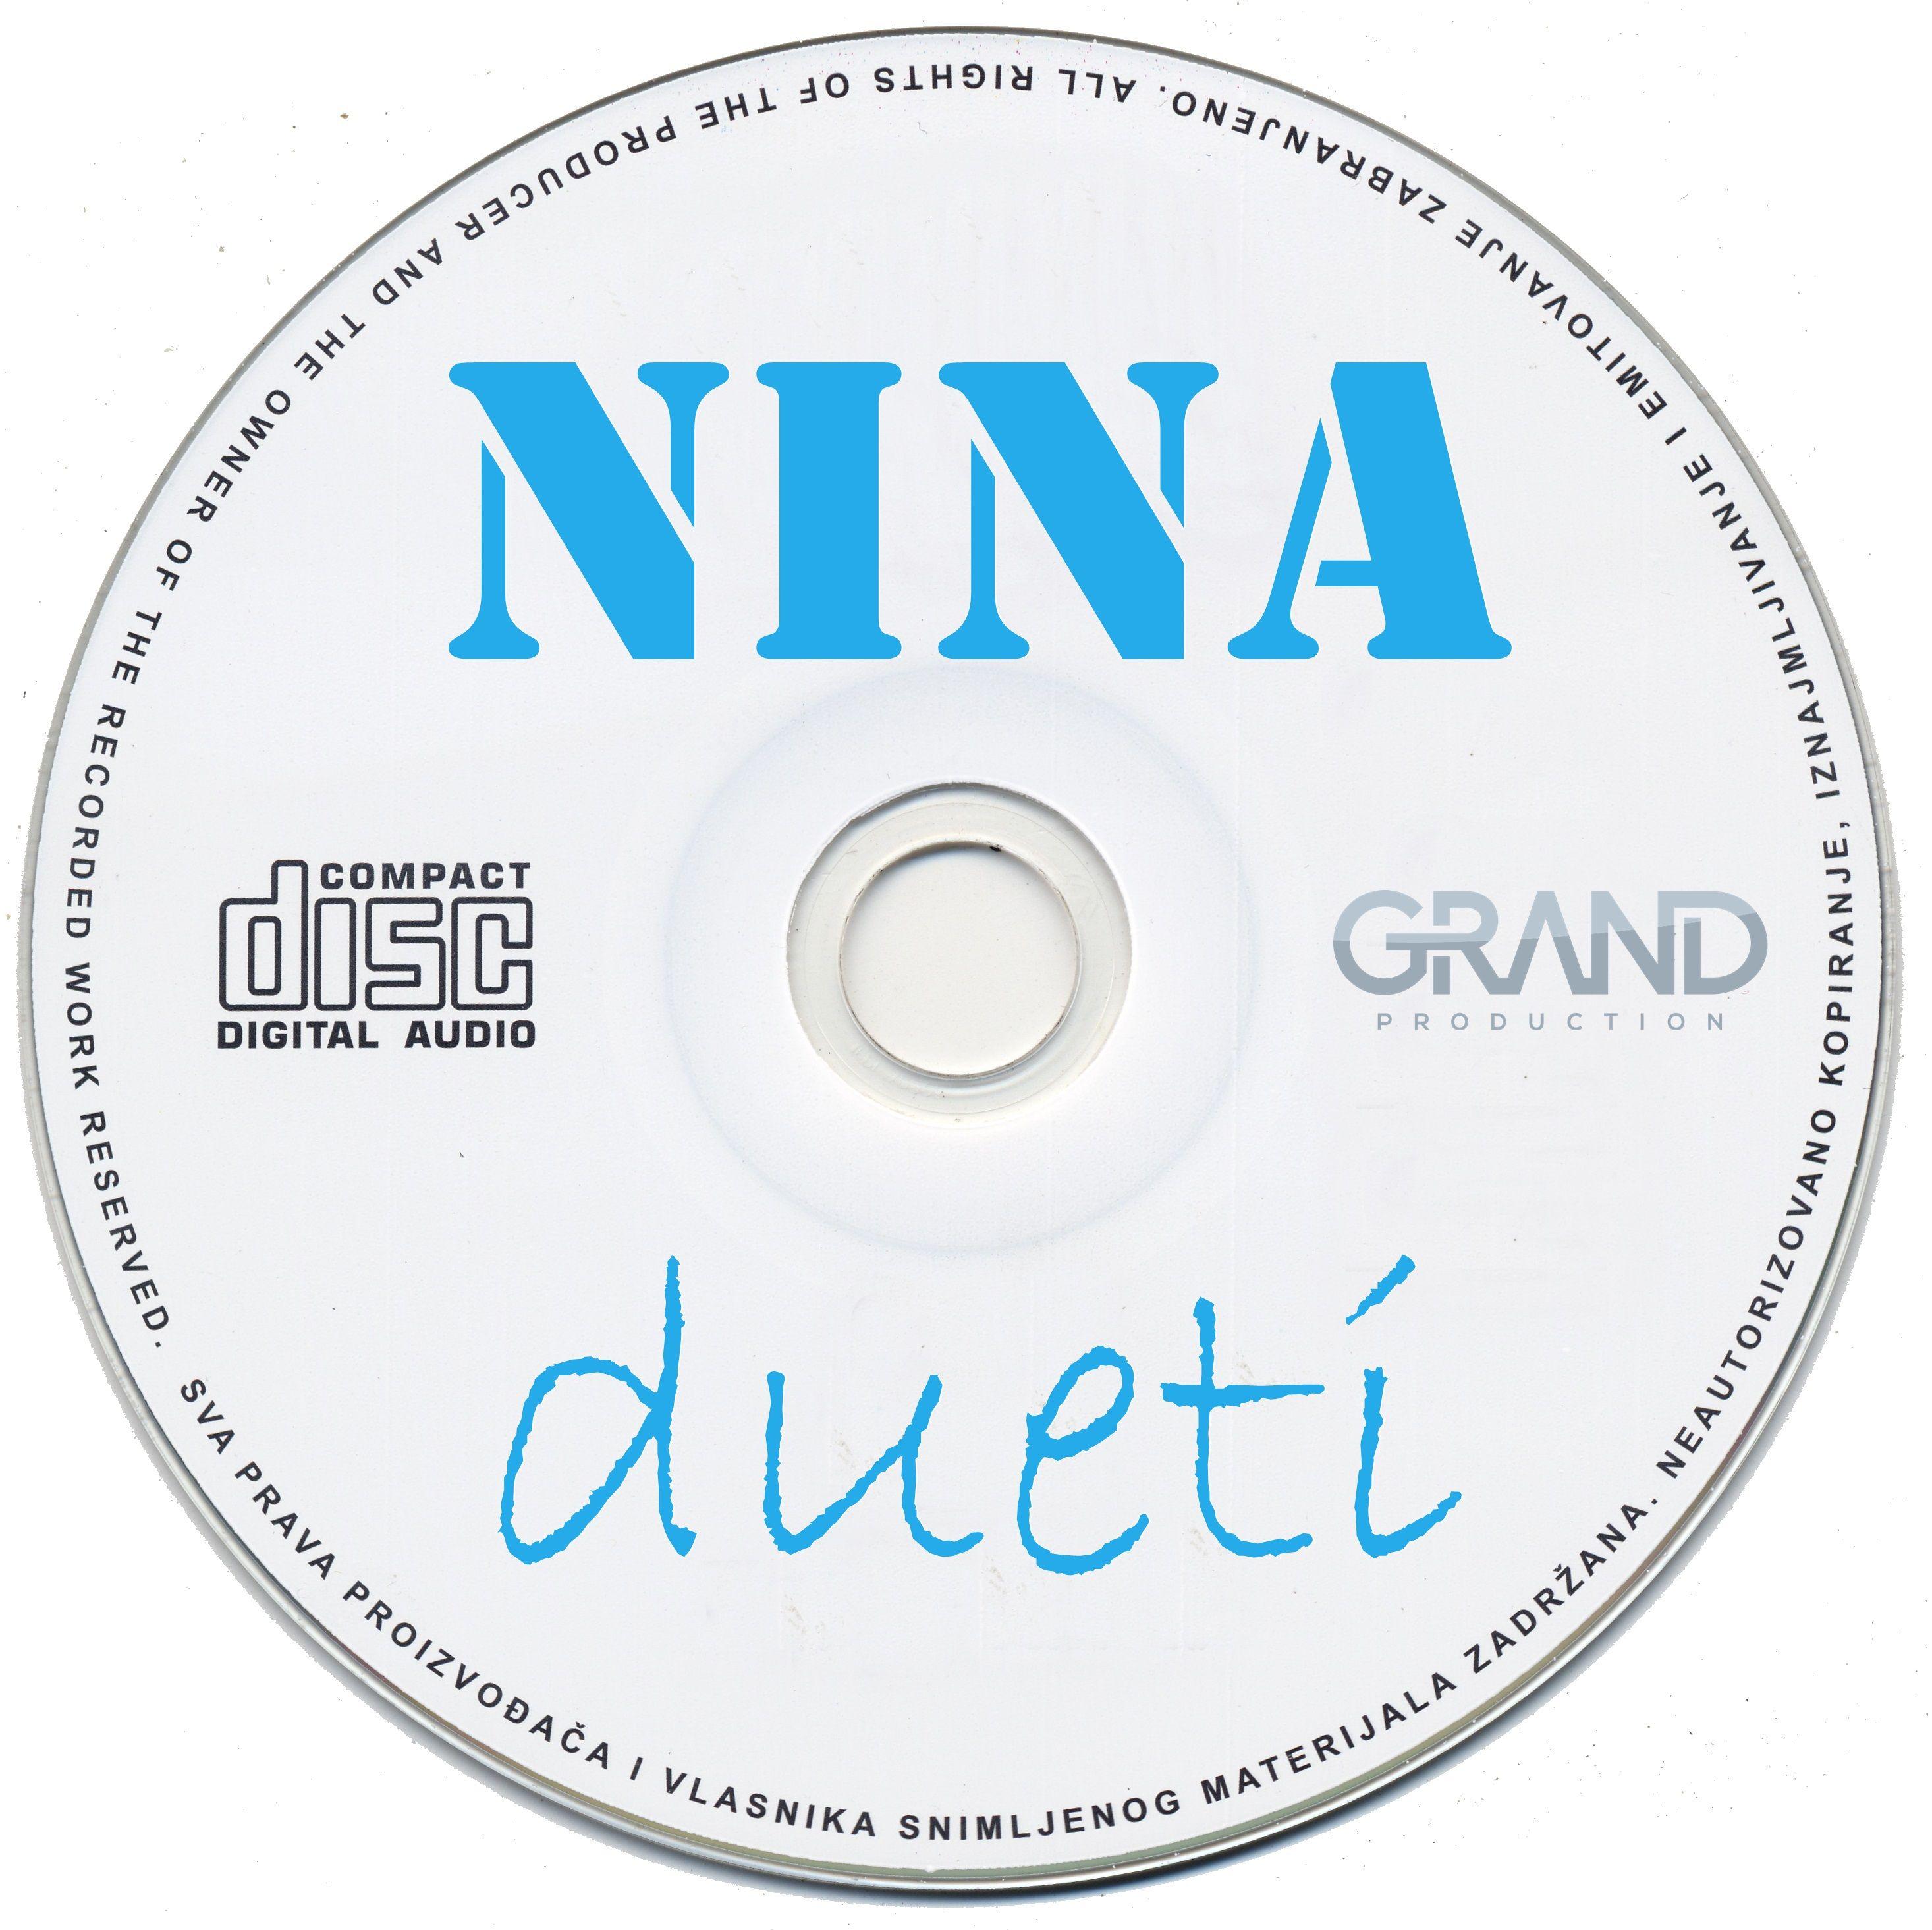 2018 cd